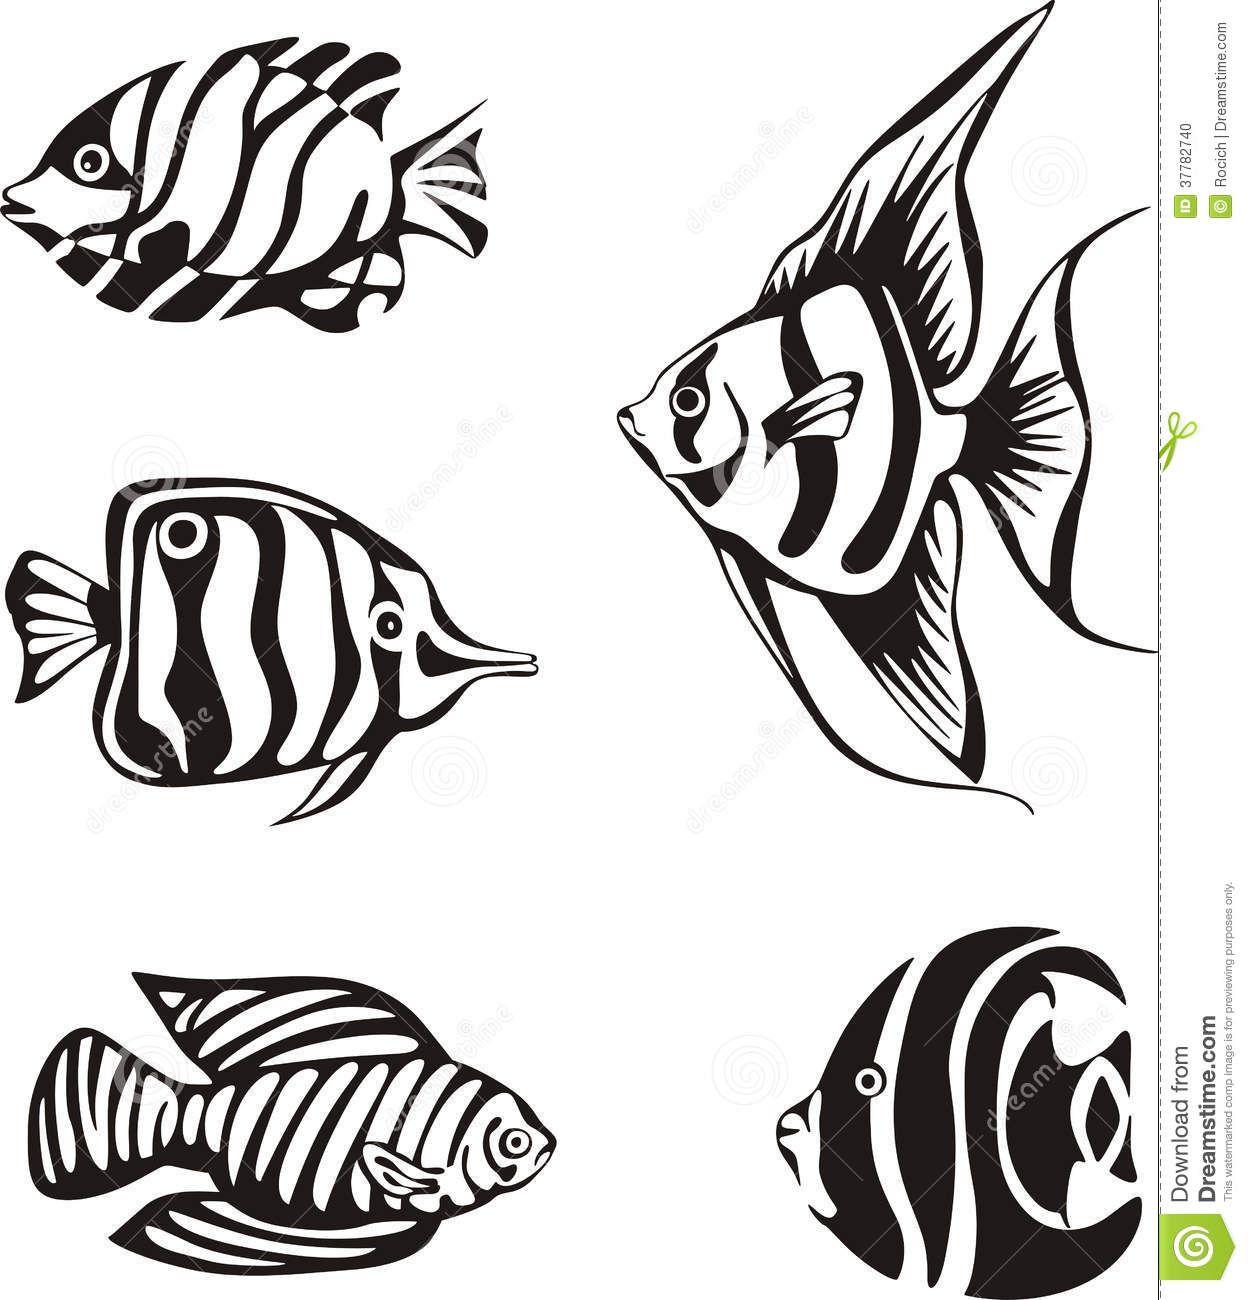 Tropical Fish Stencil